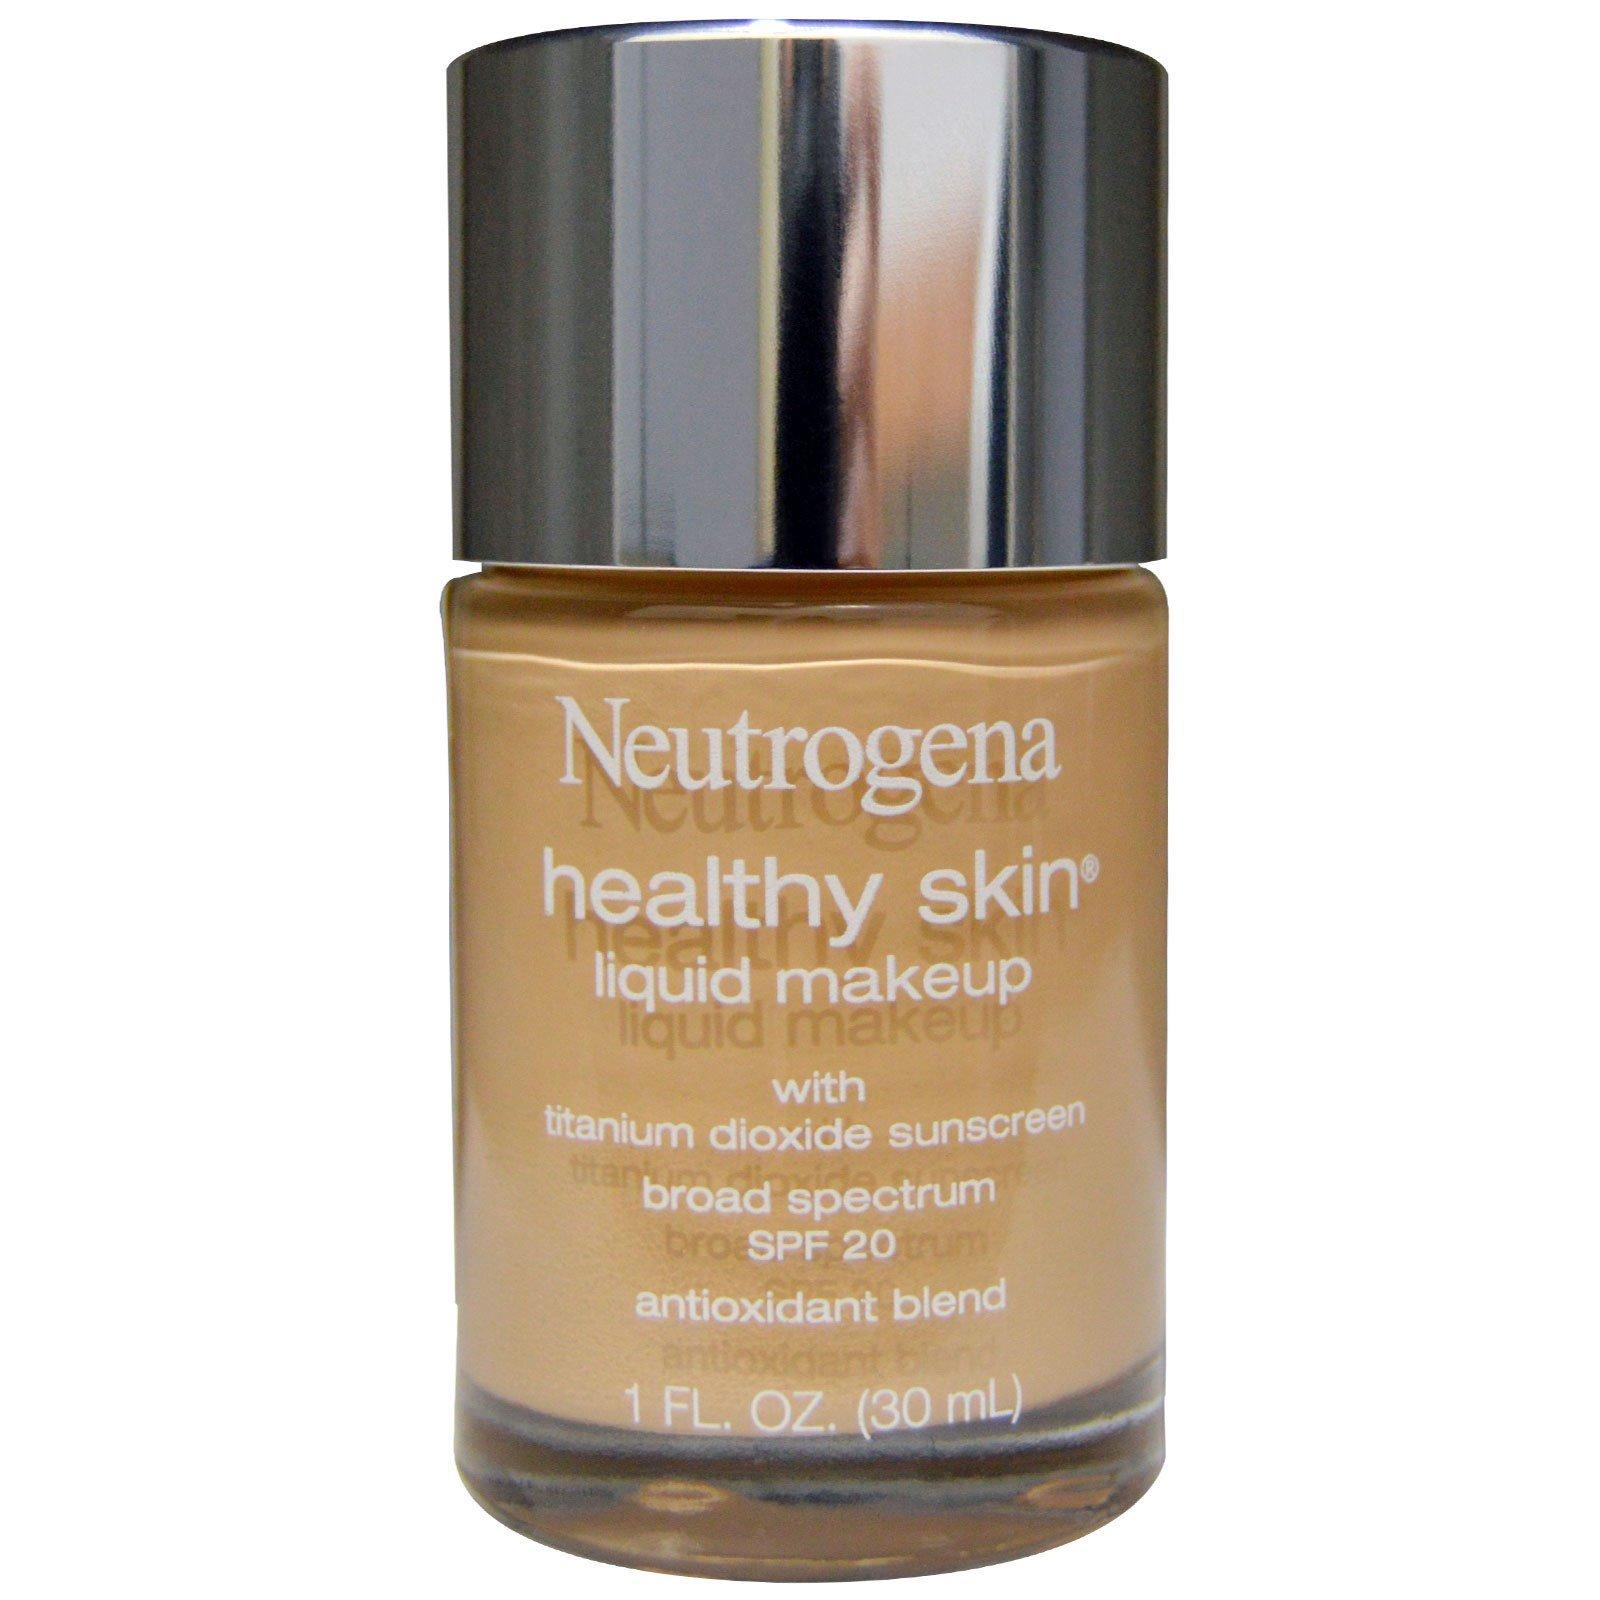 10a09460c Neutrogena, Healthy Skin Liquid Makeup, SPF 20, Nude 40, 1 fl oz (30 ml)